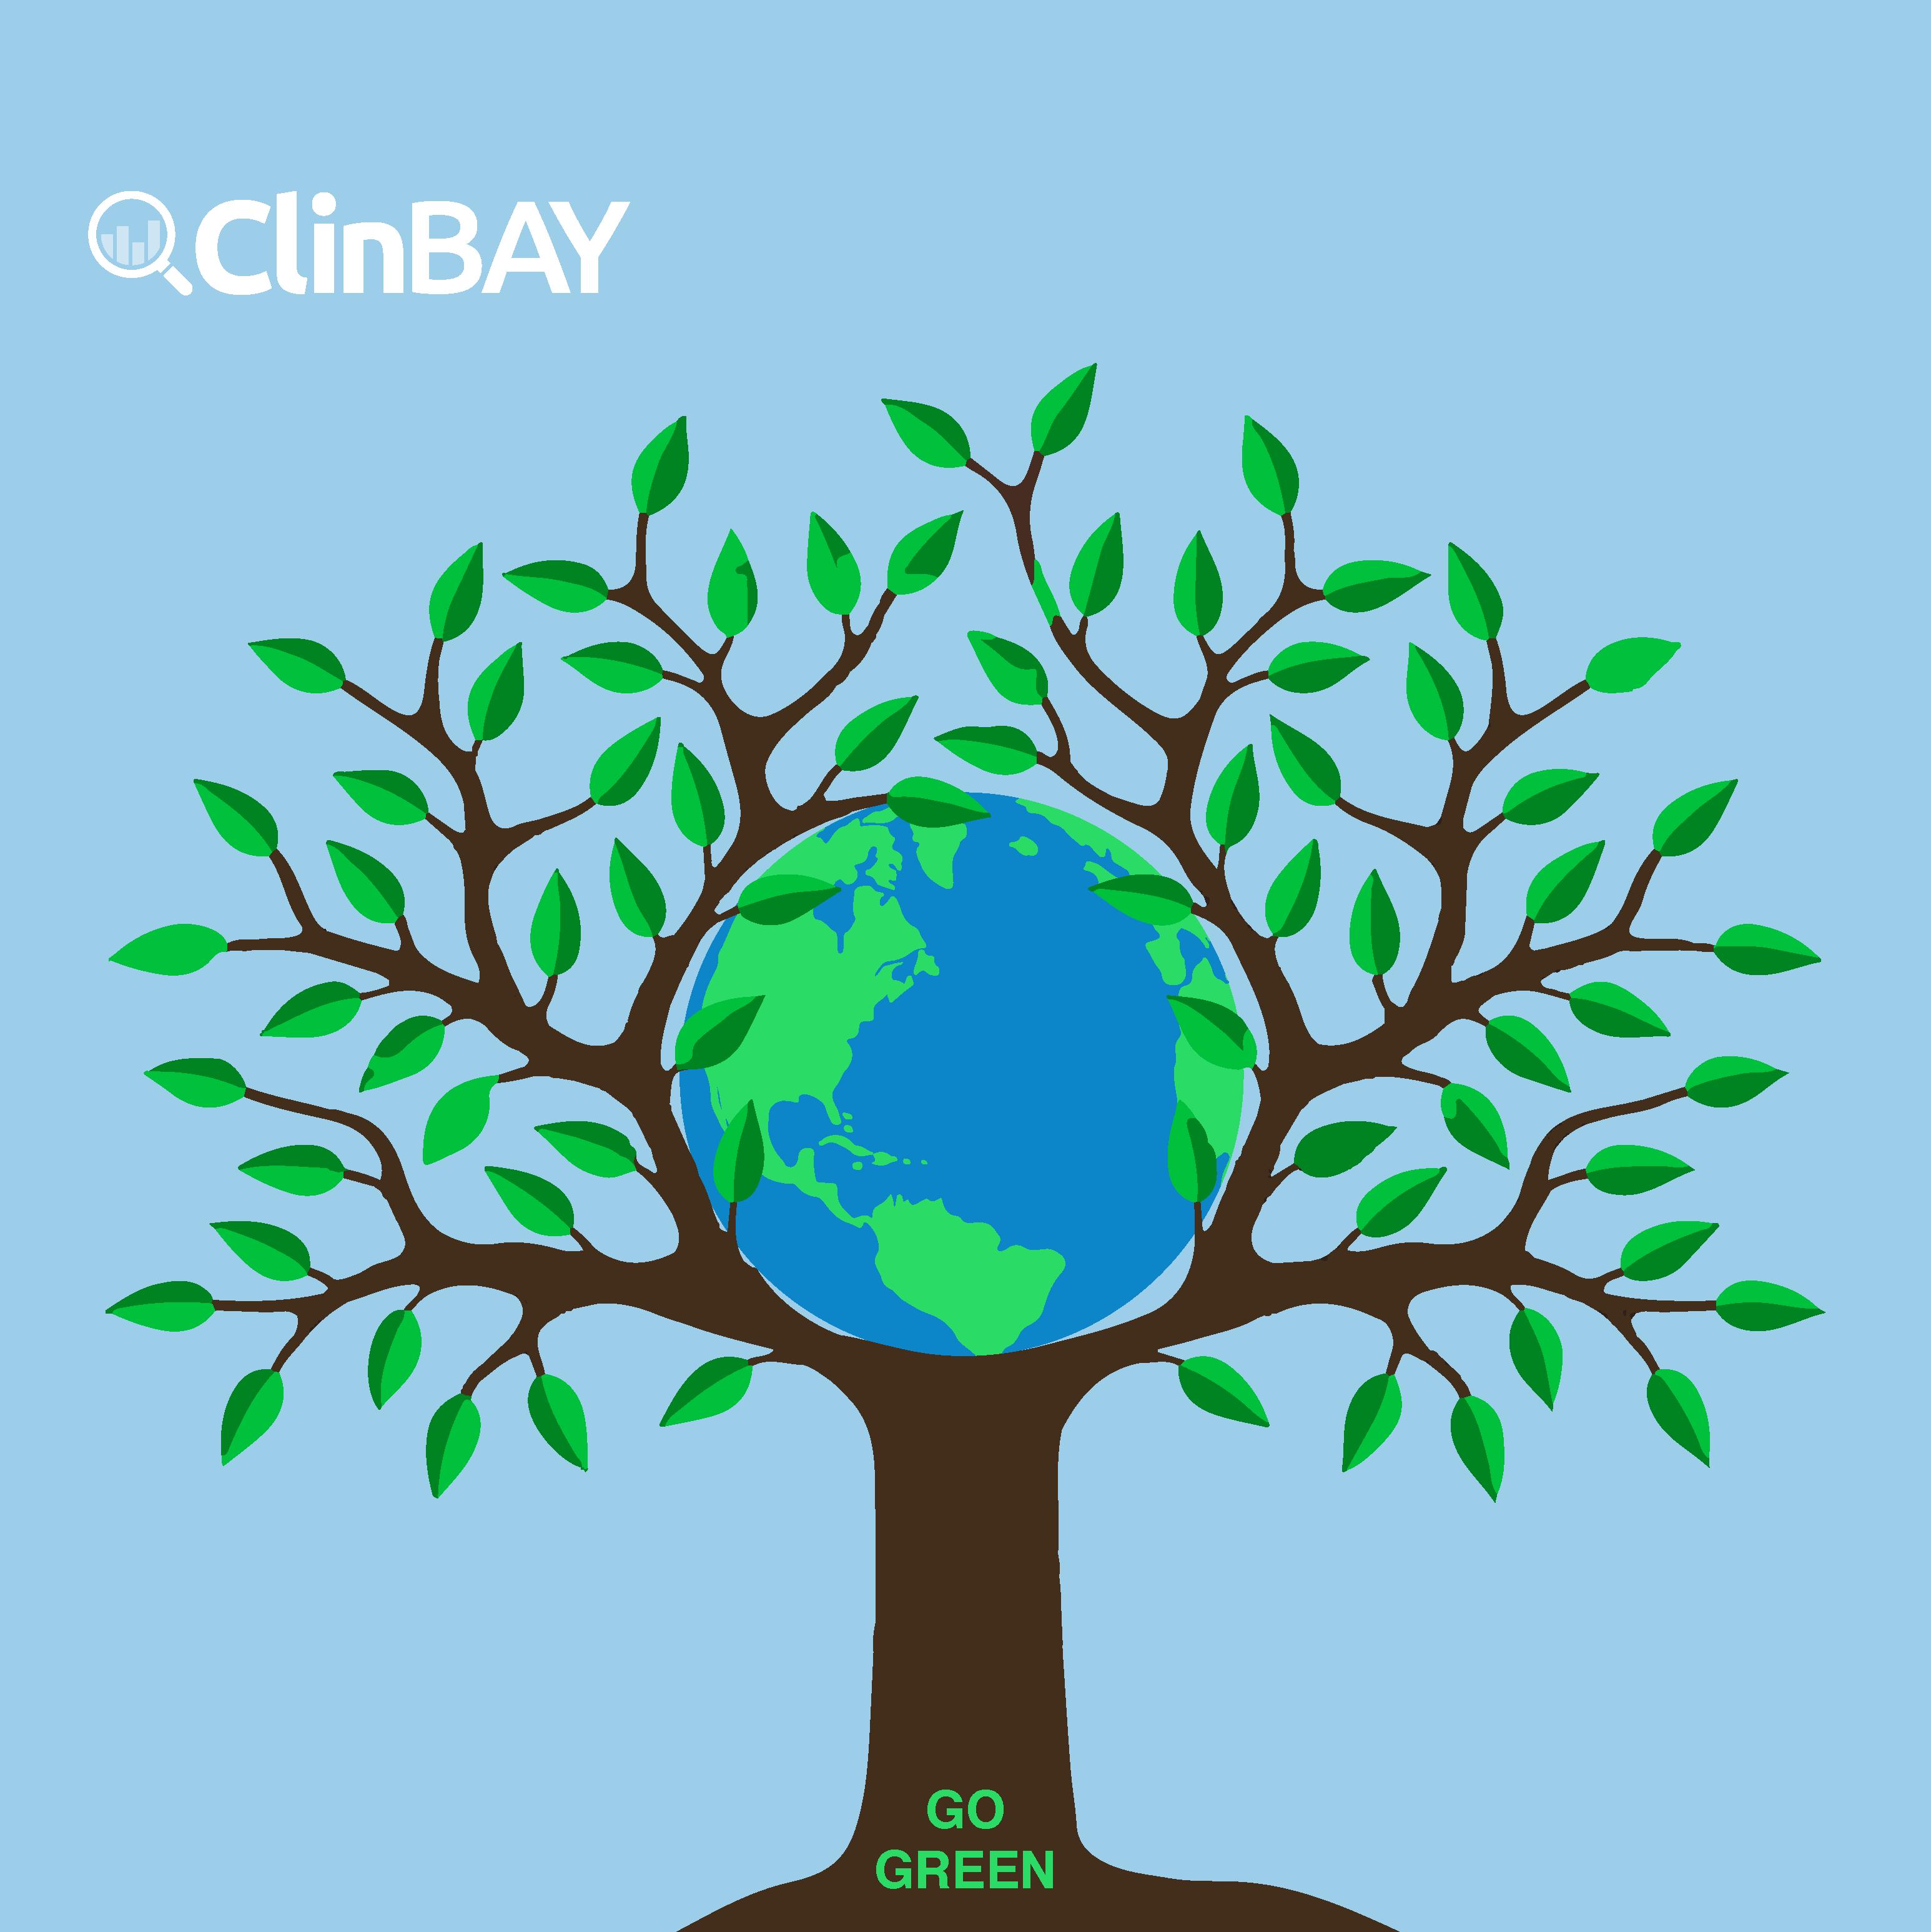 ClinBAY Green policy